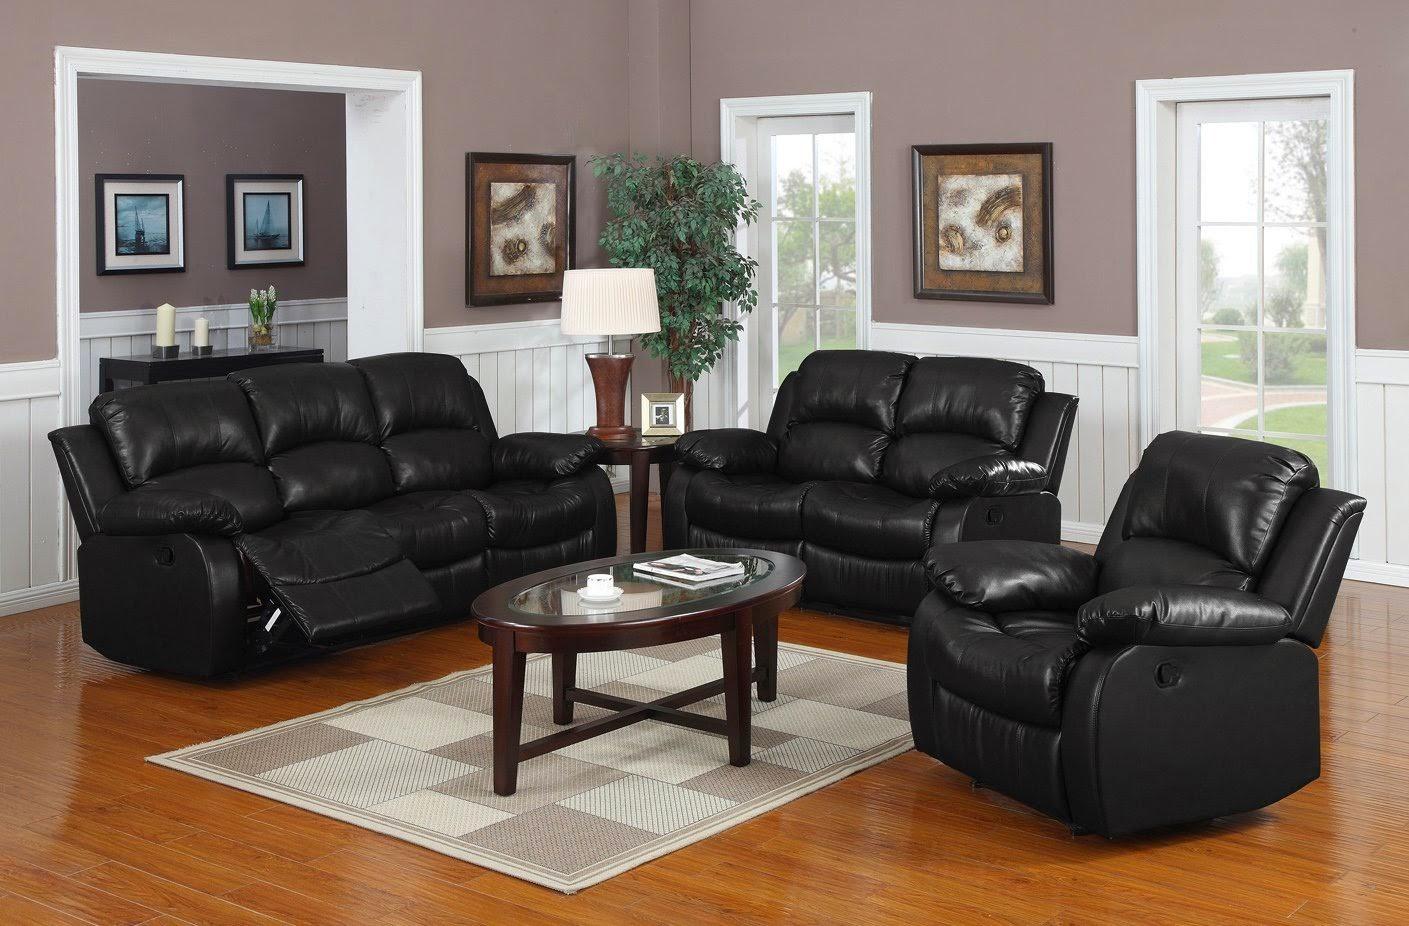 Second Hand Black Leather Recliner Sofa Www Redglobalmx Org ~ Best Recliner Sofa Brands